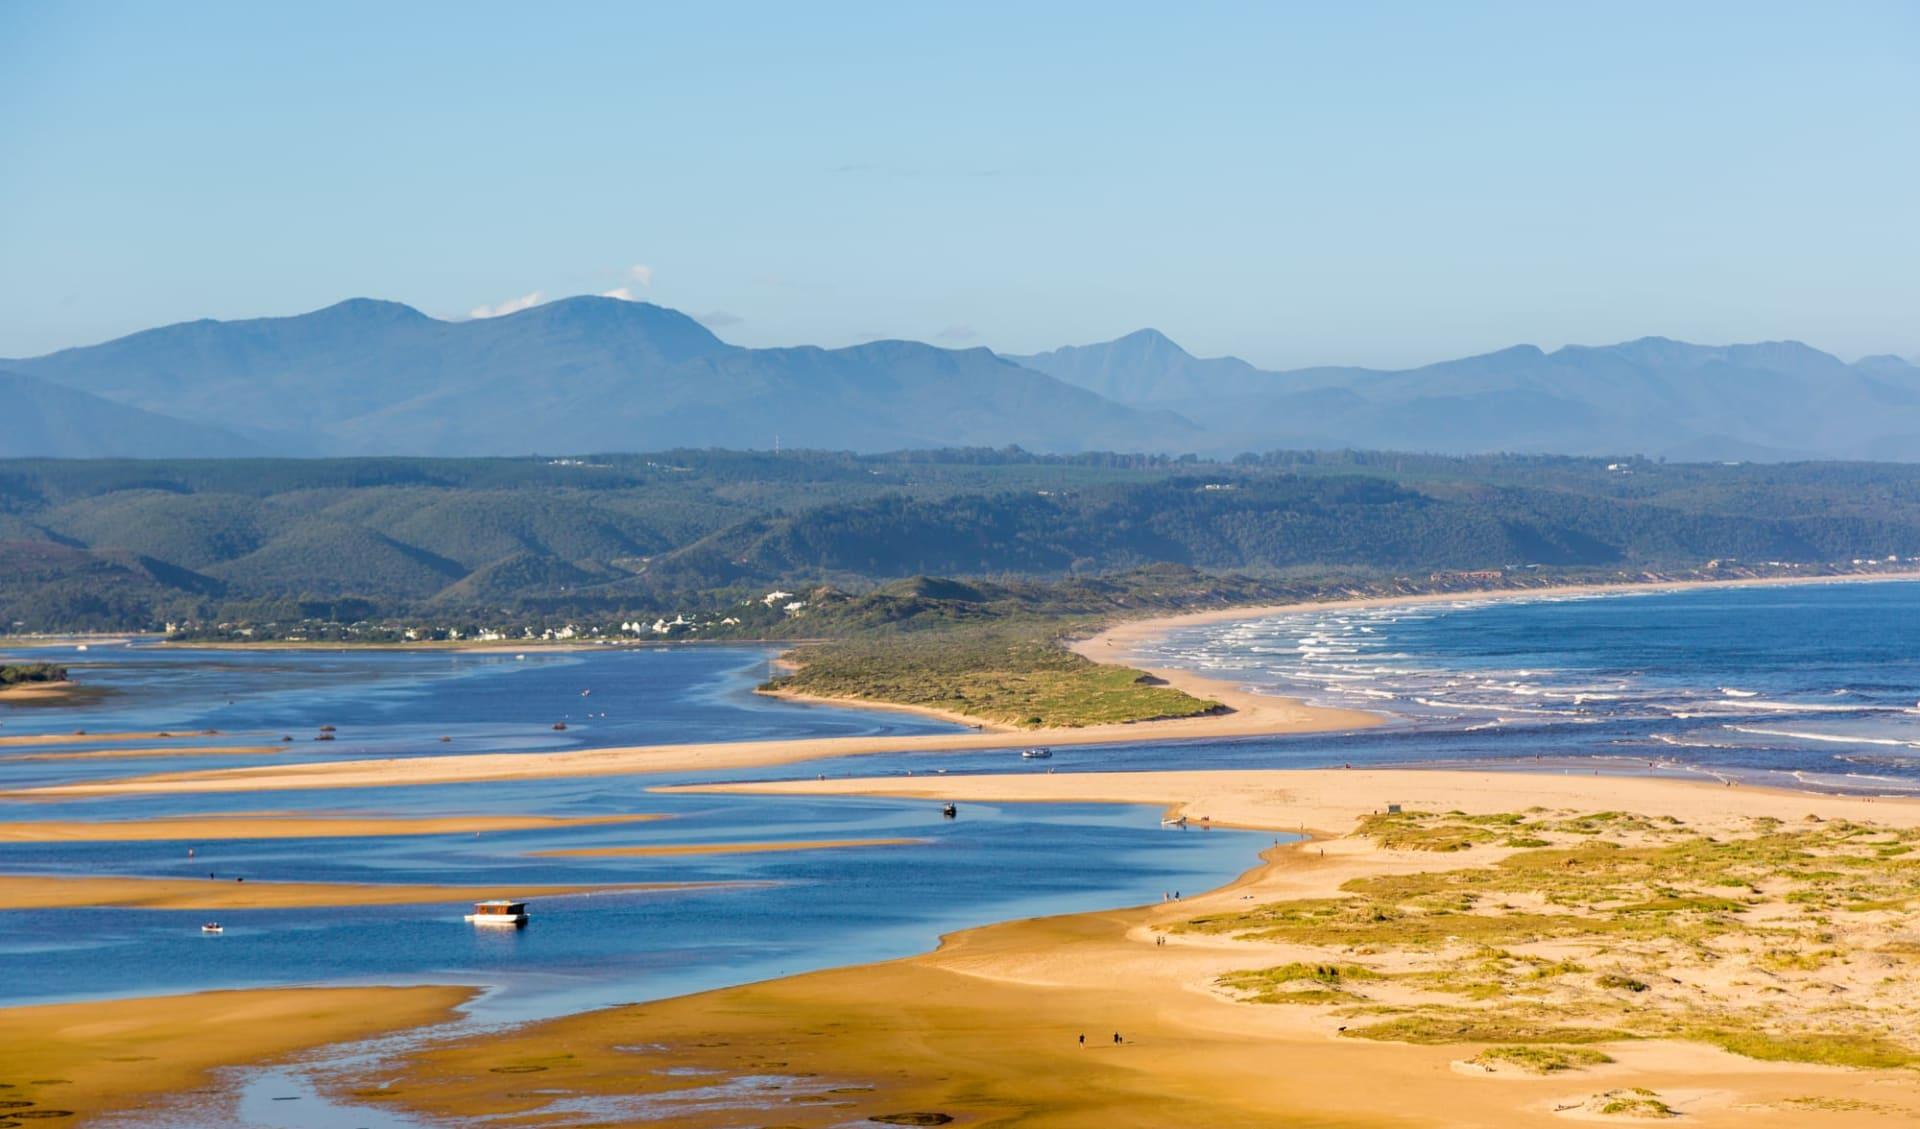 Kaléidoscope du Cap ab Kapstadt: Südafrika - Garden Route - Knynsa Lagune